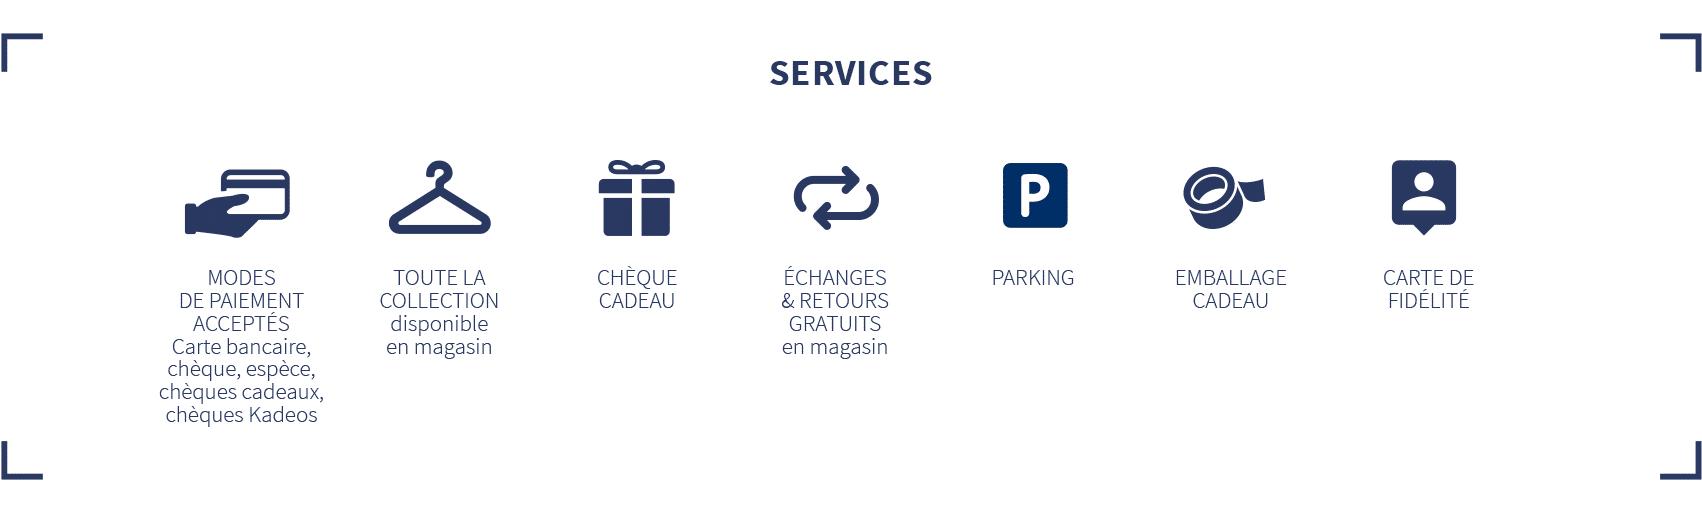 services proposés en magasin Loctudy